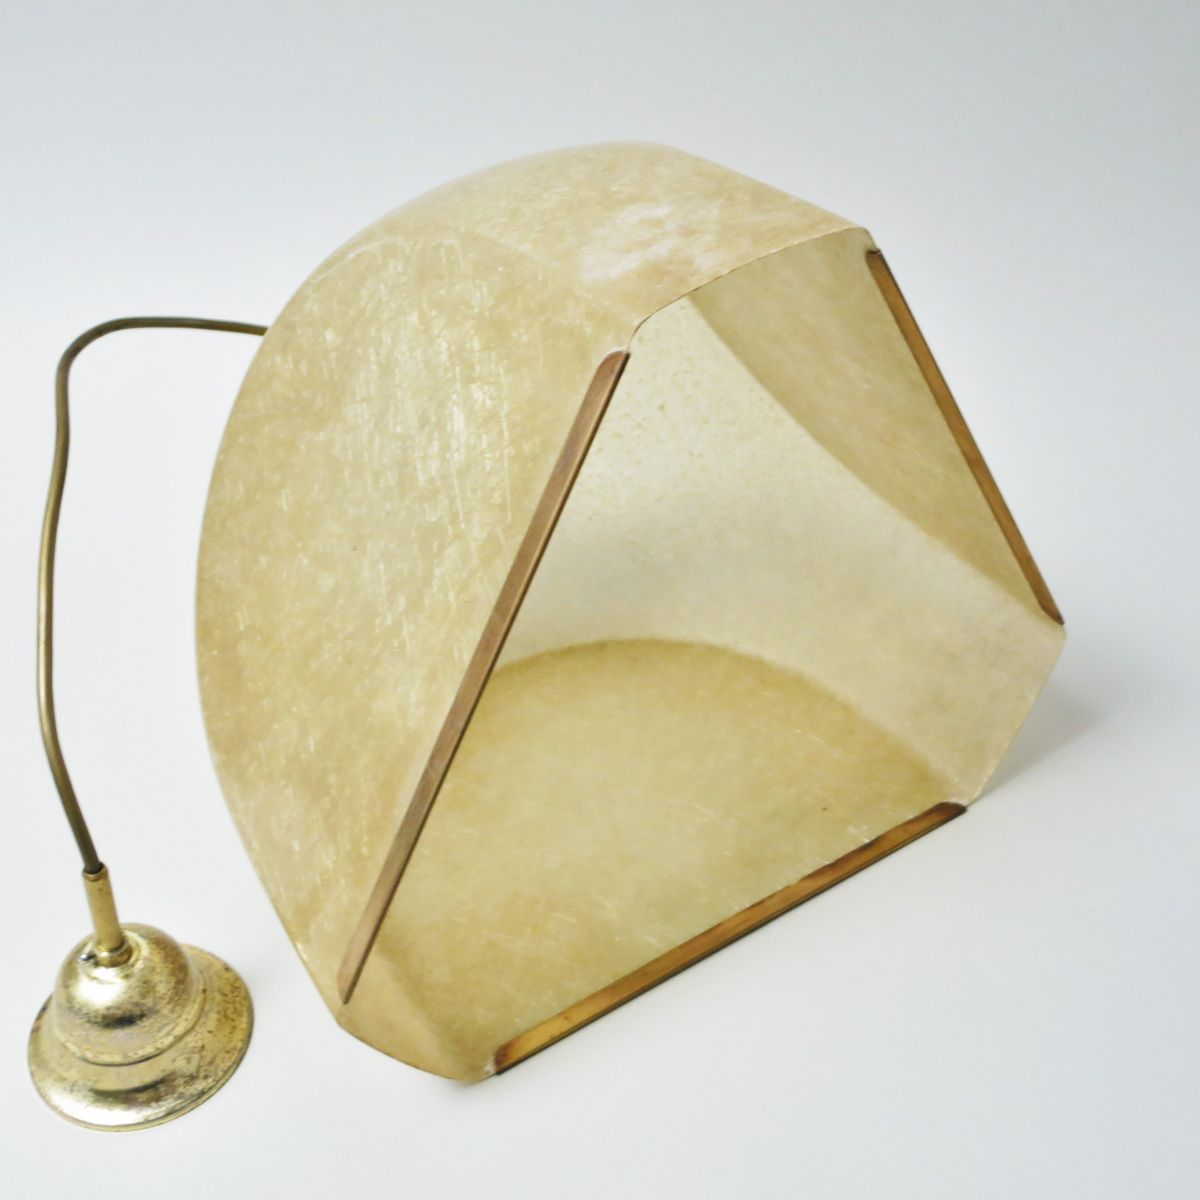 lampe suspension tricia vintage en fibre de verre et. Black Bedroom Furniture Sets. Home Design Ideas